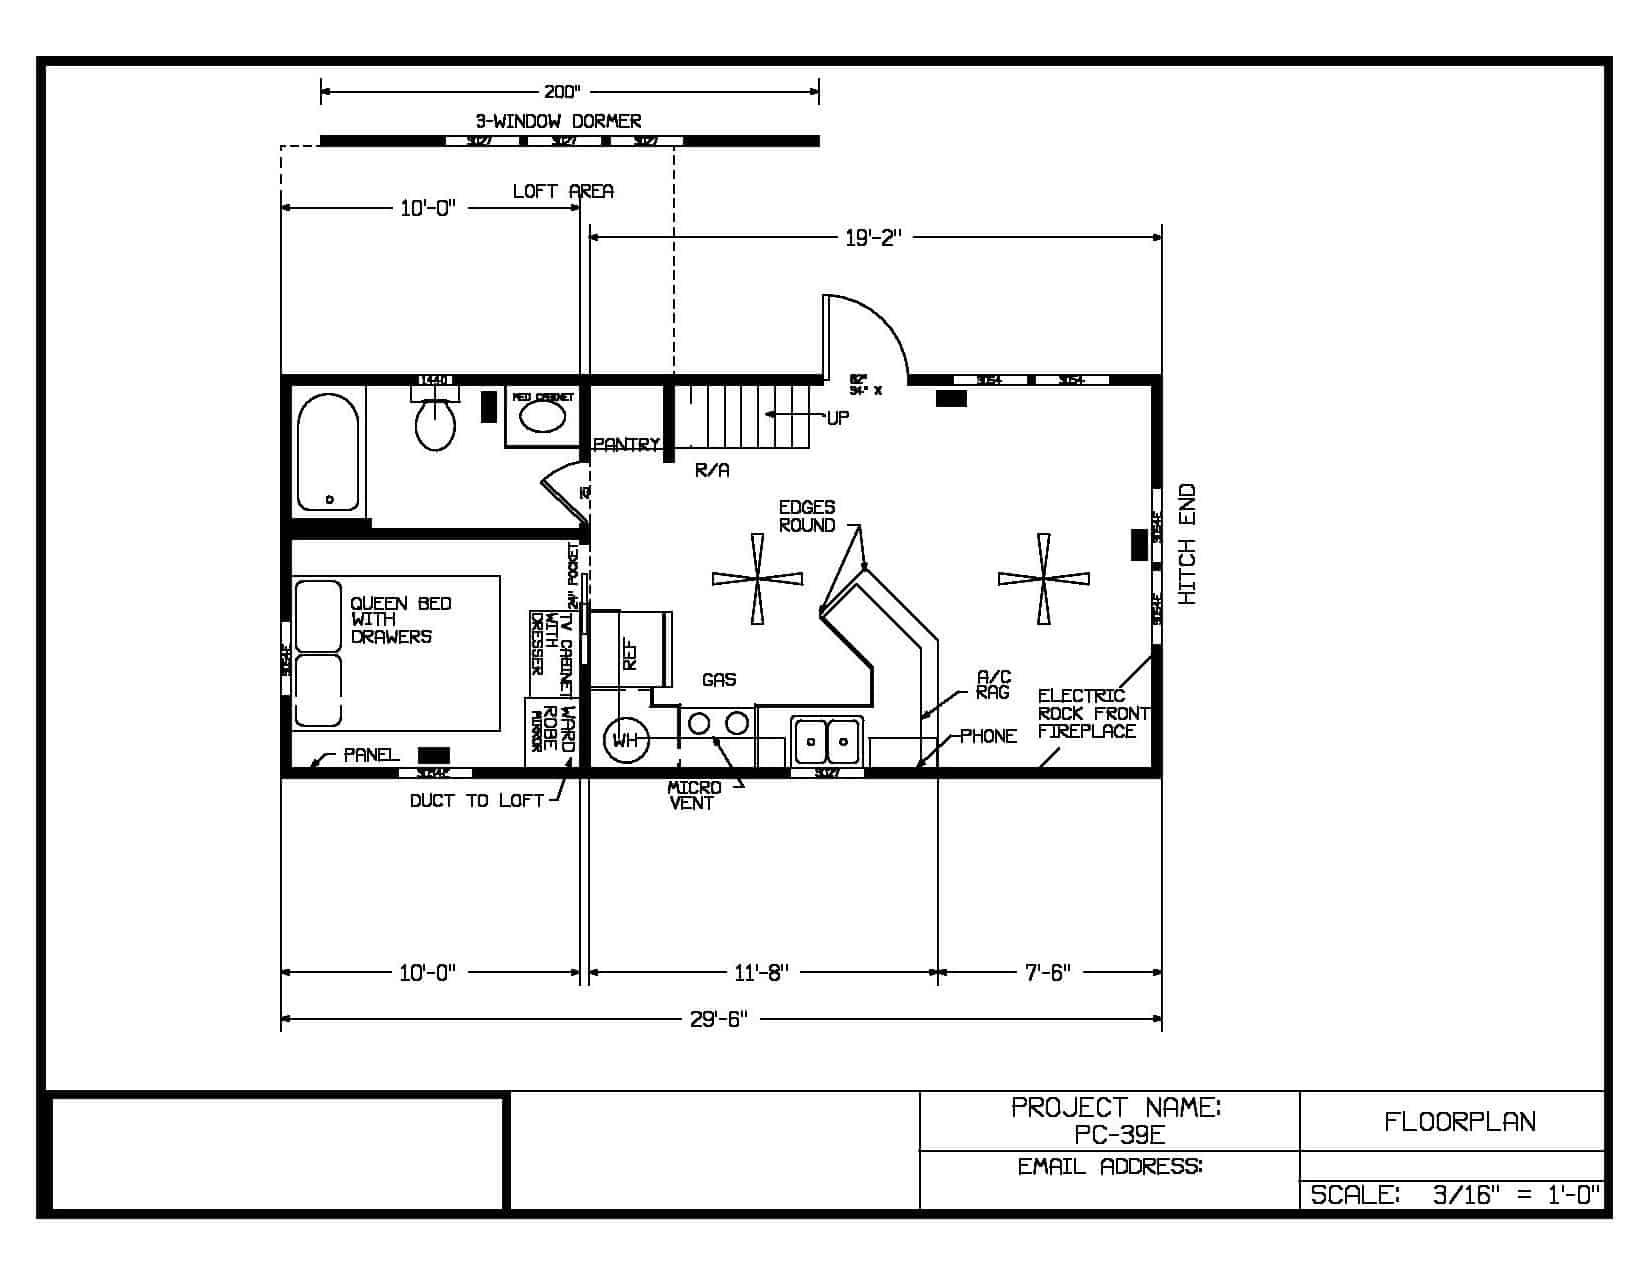 Floor Plan for the house model Arrowhead Lodge made by Pratt from Tyler Texas